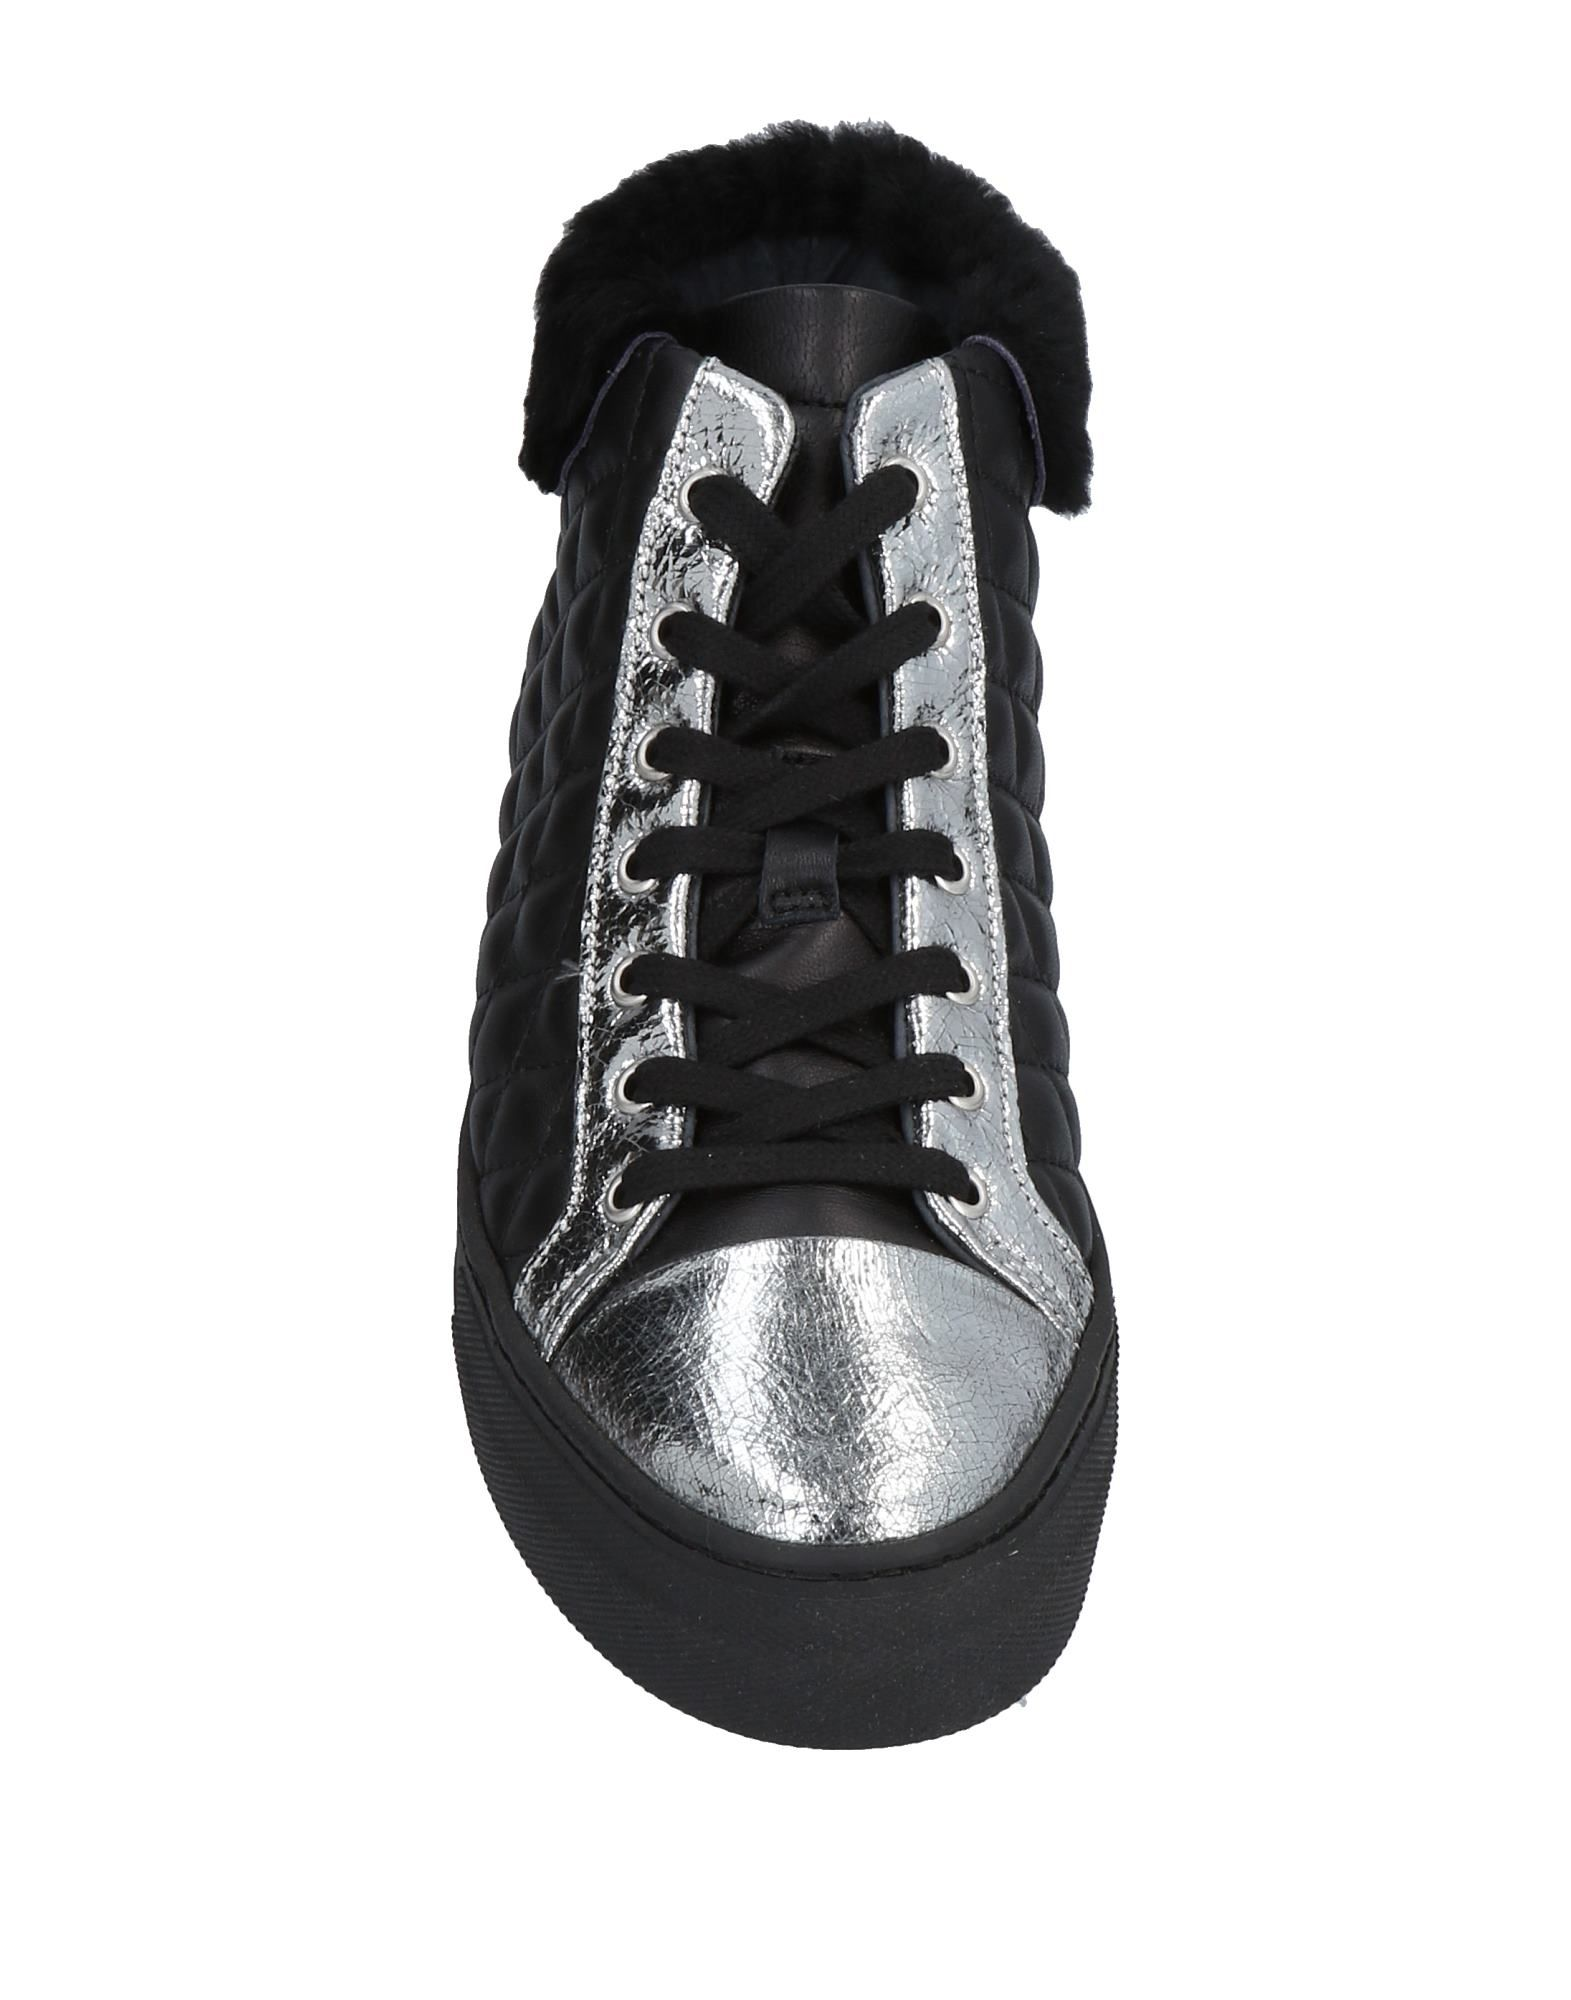 Nila & es Nila Sneakers Damen Gutes Preis-Leistungs-Verhältnis, es & lohnt sich 3827 c28679